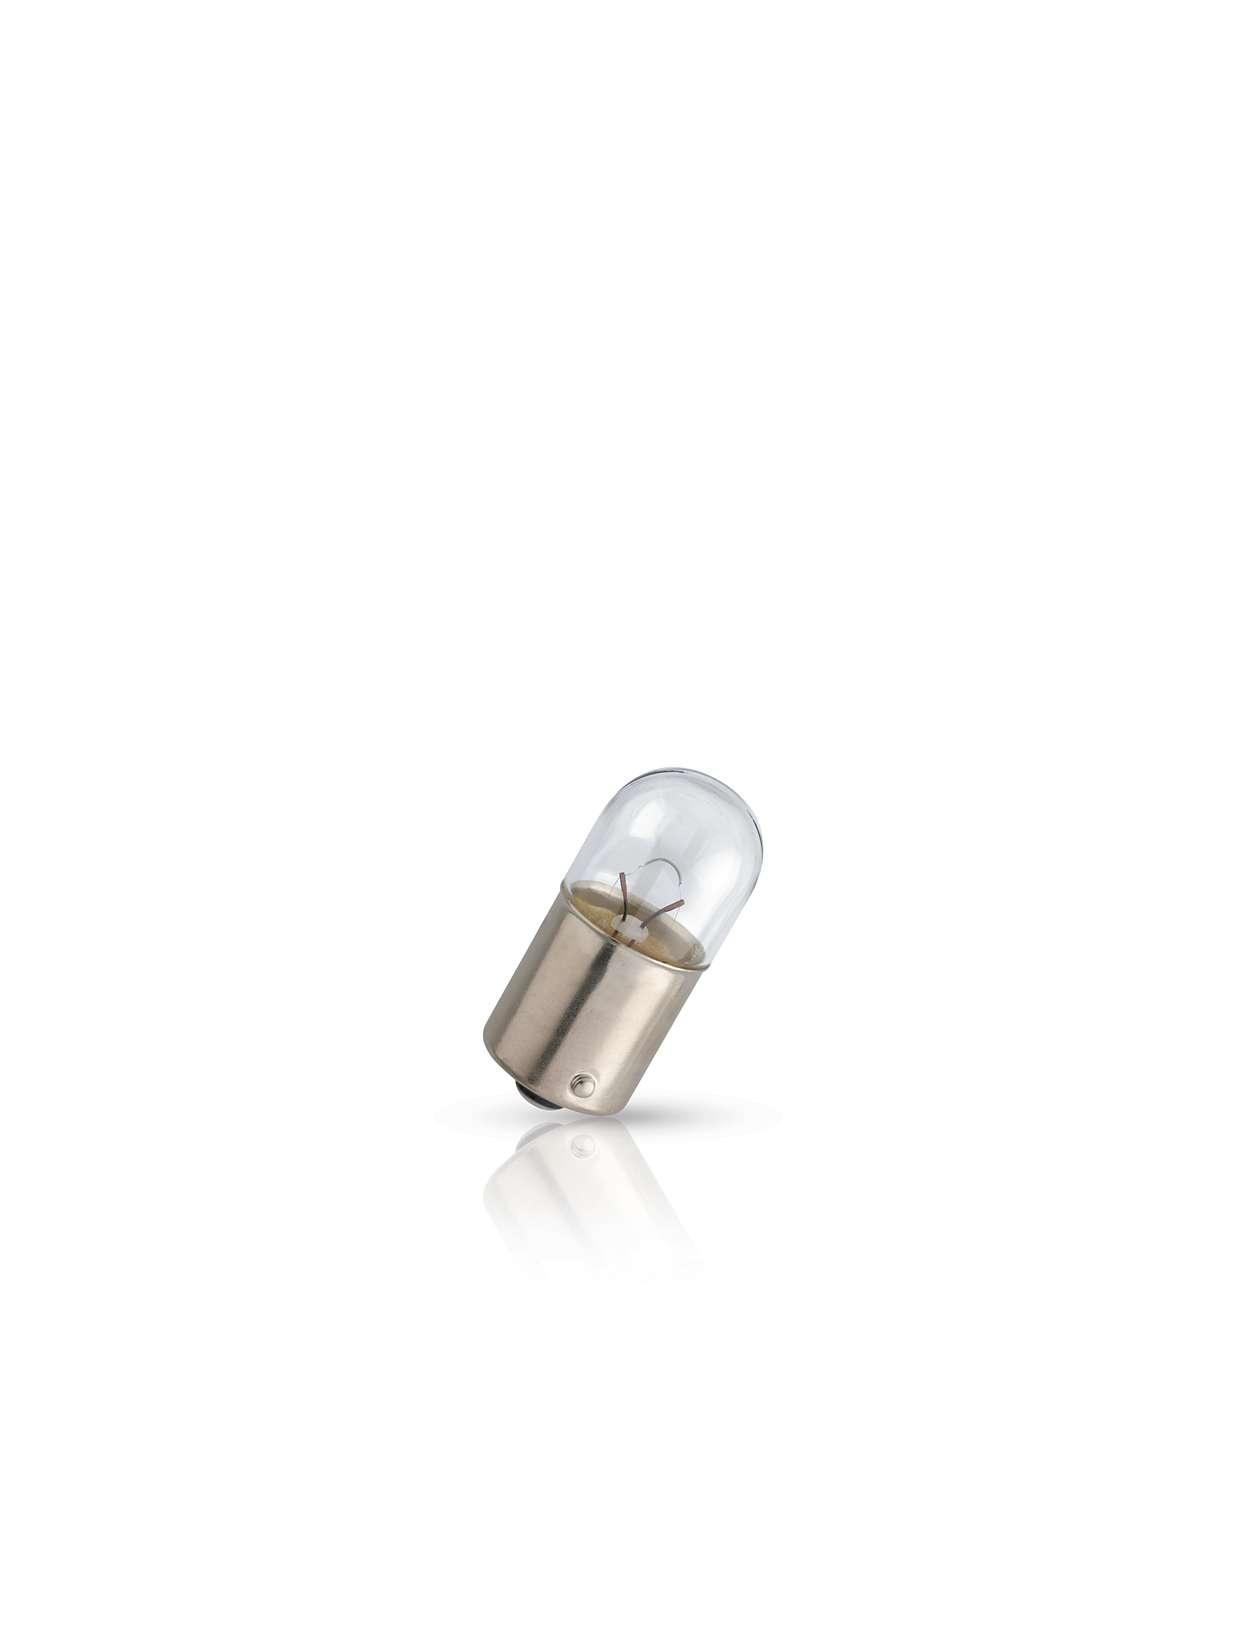 Лампа автомобильная Philips 12821llecob2 (бл.) автомобильная лампа r5w 5w longlife ecovision 2 шт philips